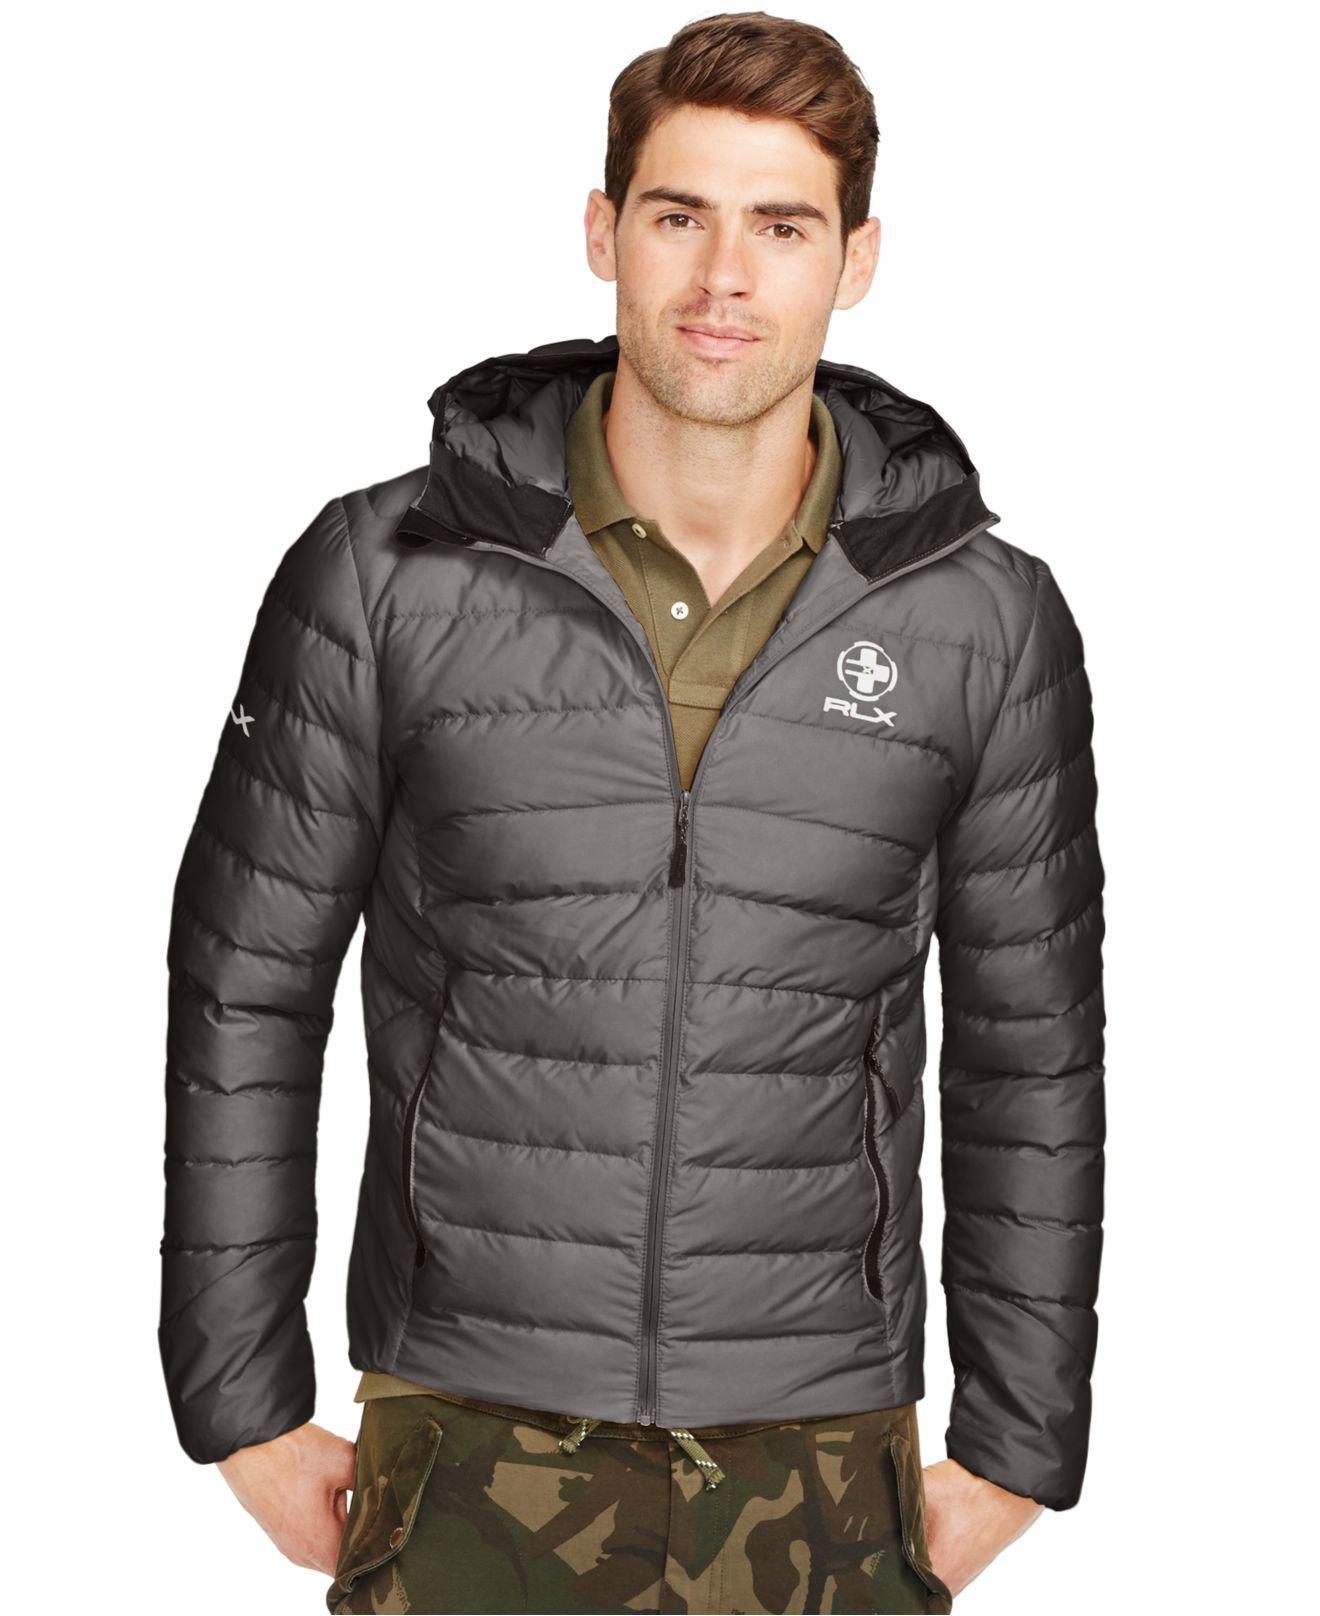 63cecb90 Polo Ralph Lauren Rlx Explorer Down Jacket in Gray for Men - Lyst